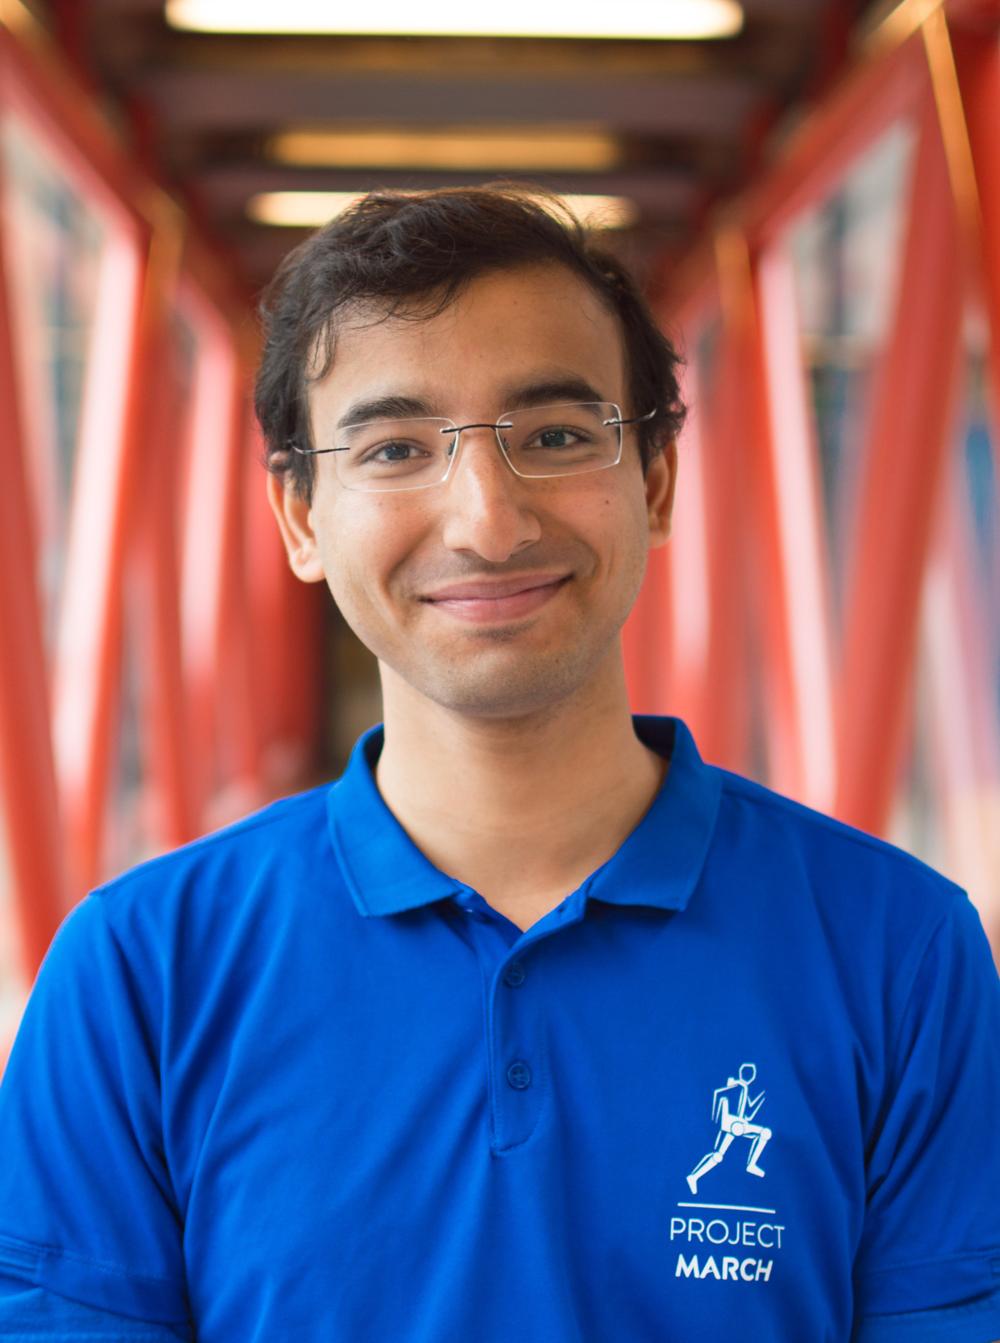 Anirudh Bisht - Electrical Engineer